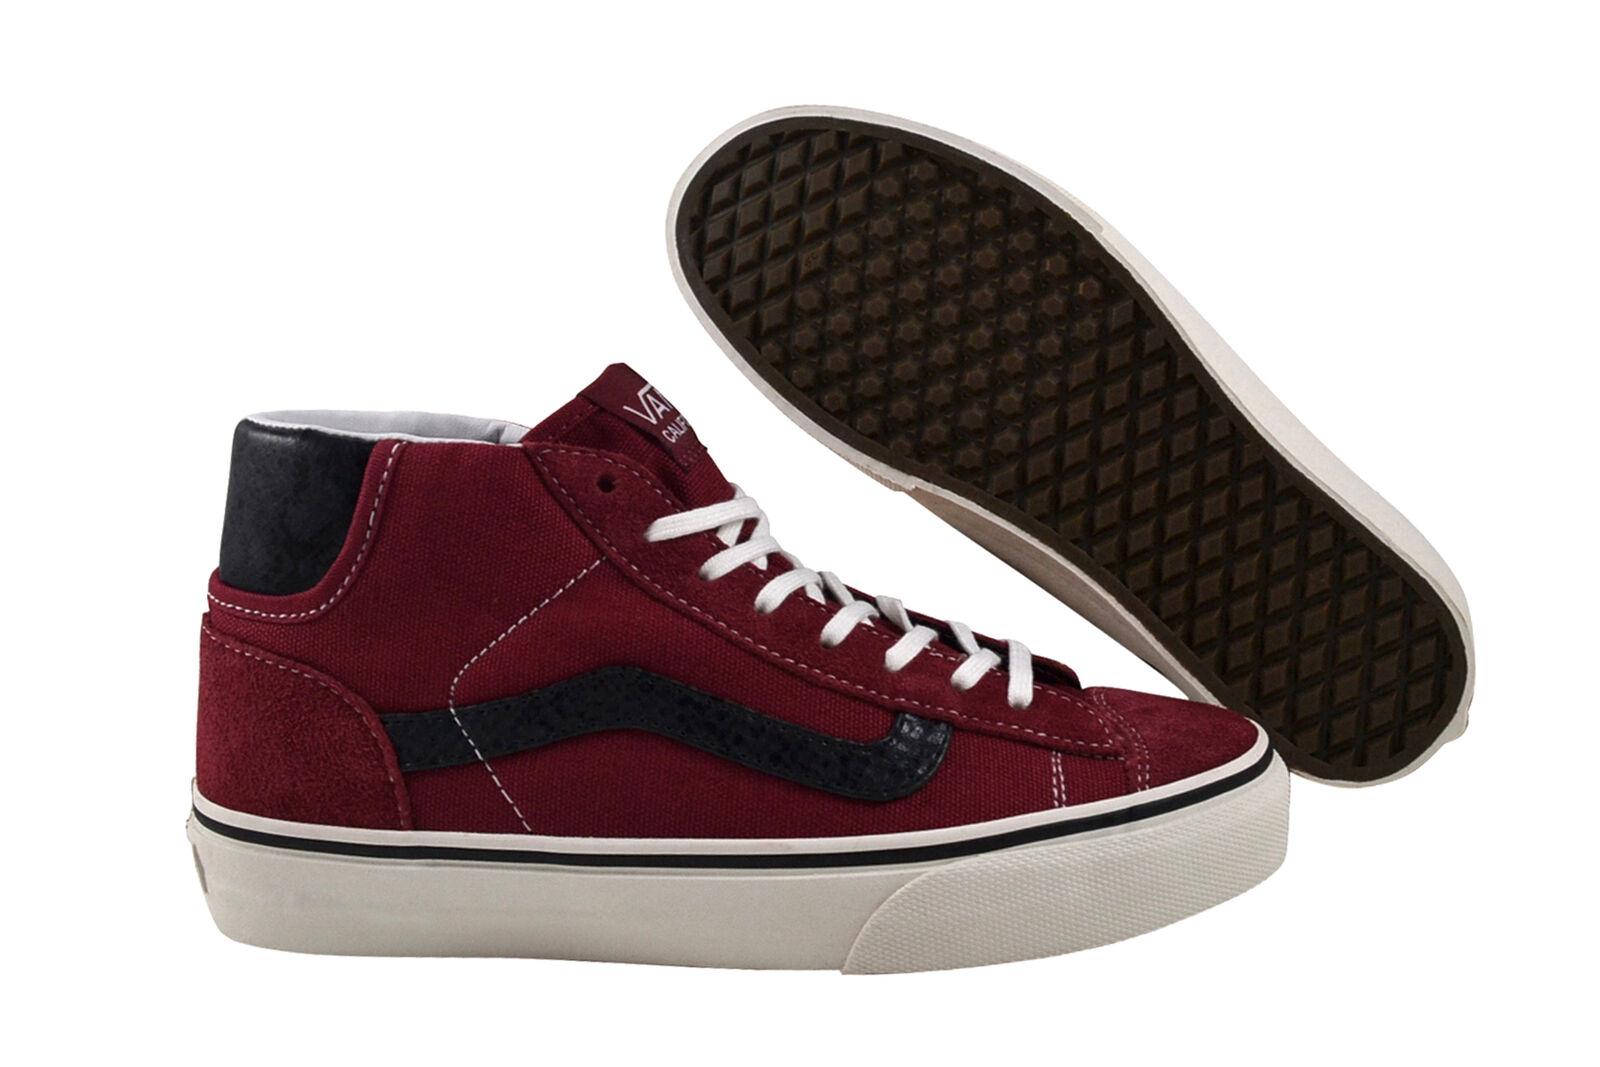 Vans Mid Skool '77 CA (suede) rio rot Turnschuhe Schuhe LYMC5D rot